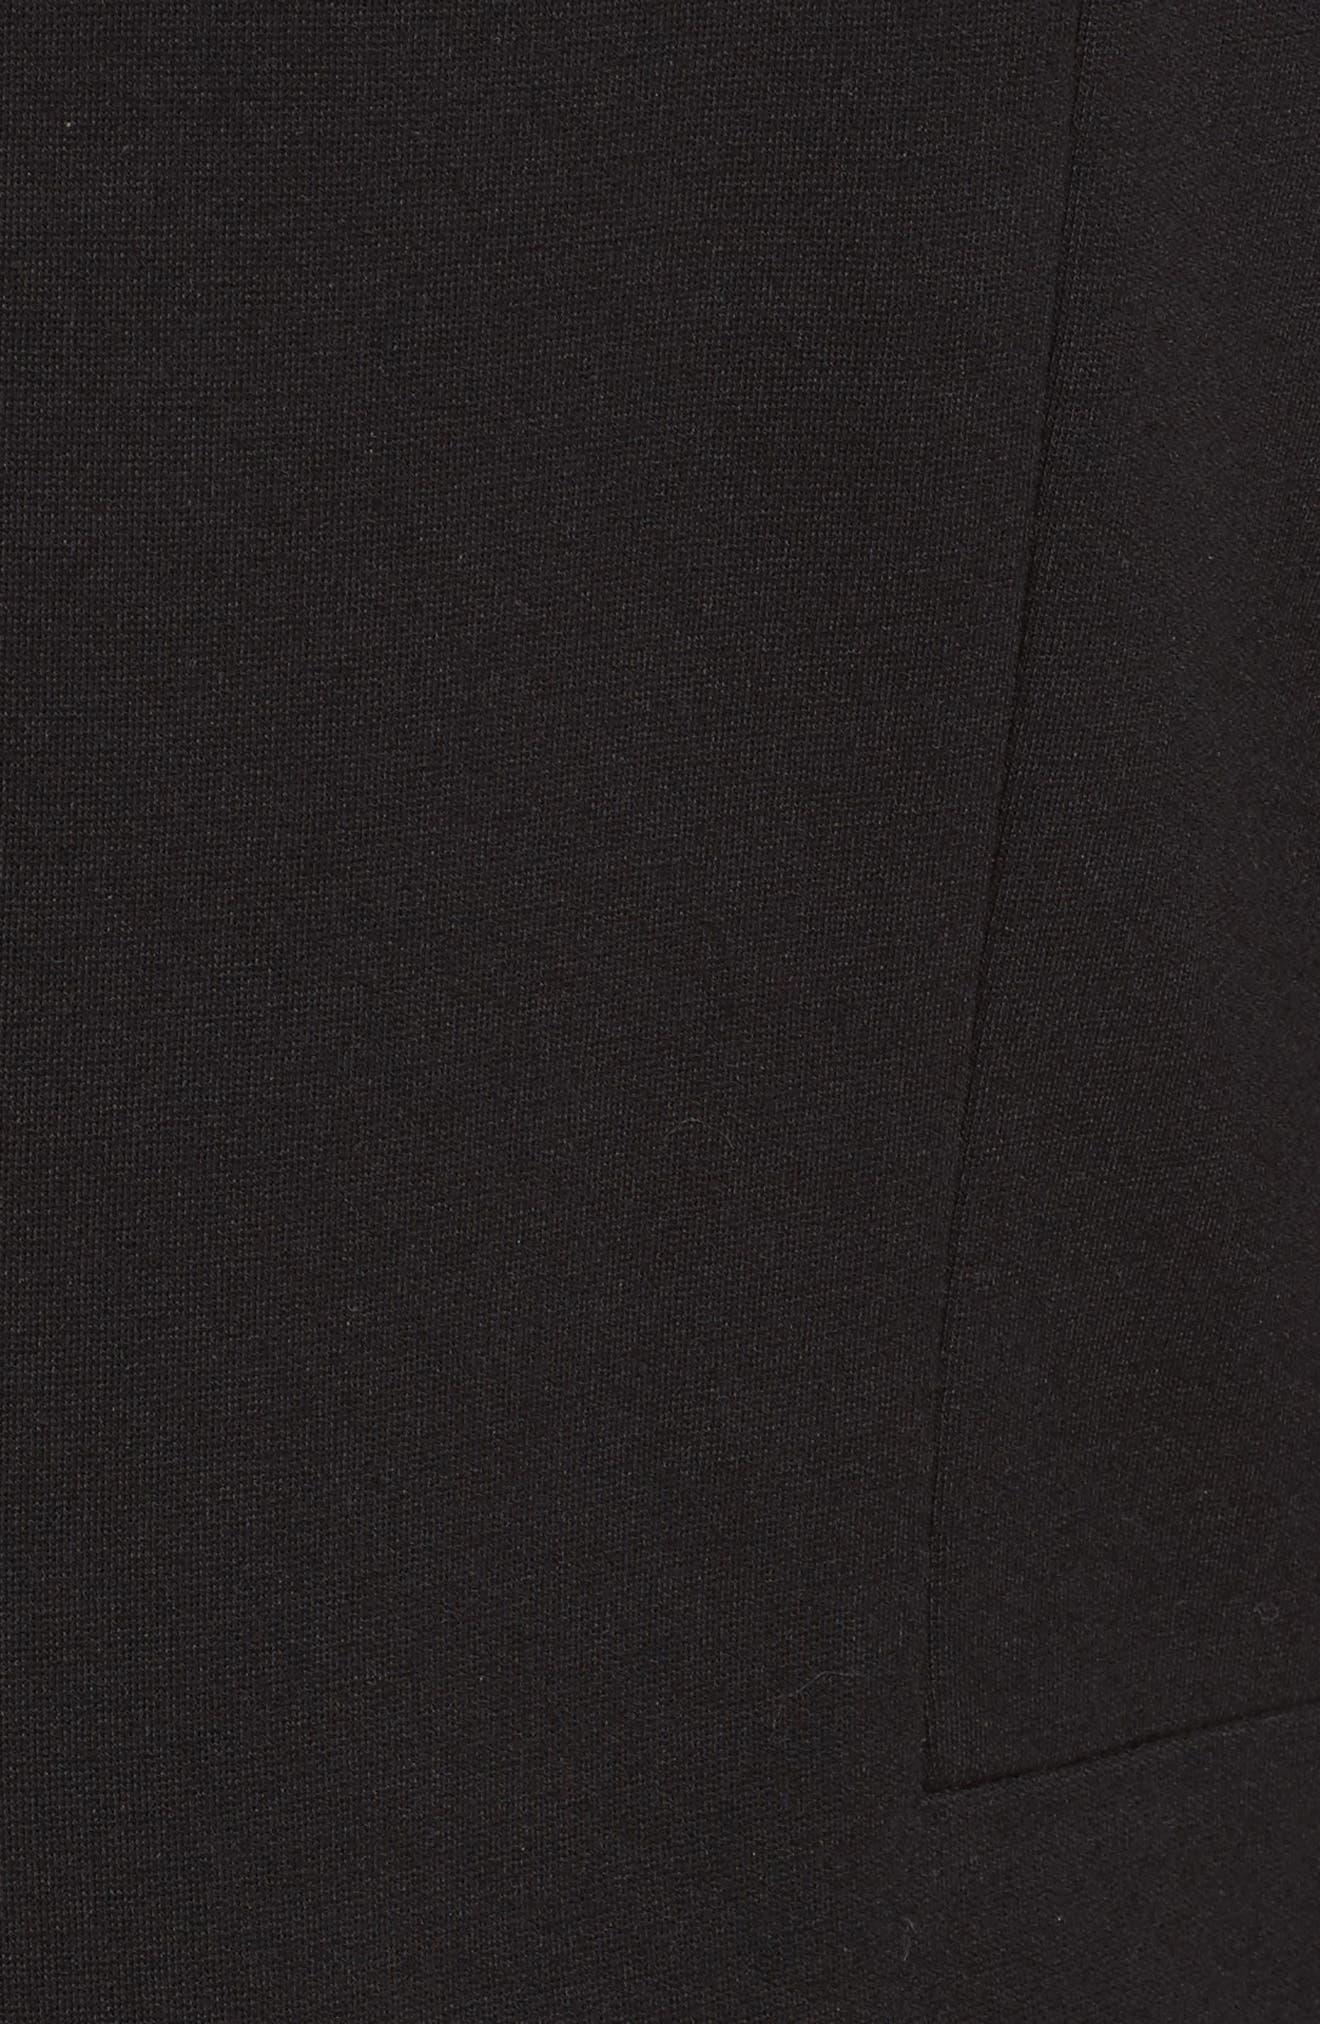 Marissa Punto Milano Dress,                             Alternate thumbnail 5, color,                             Black